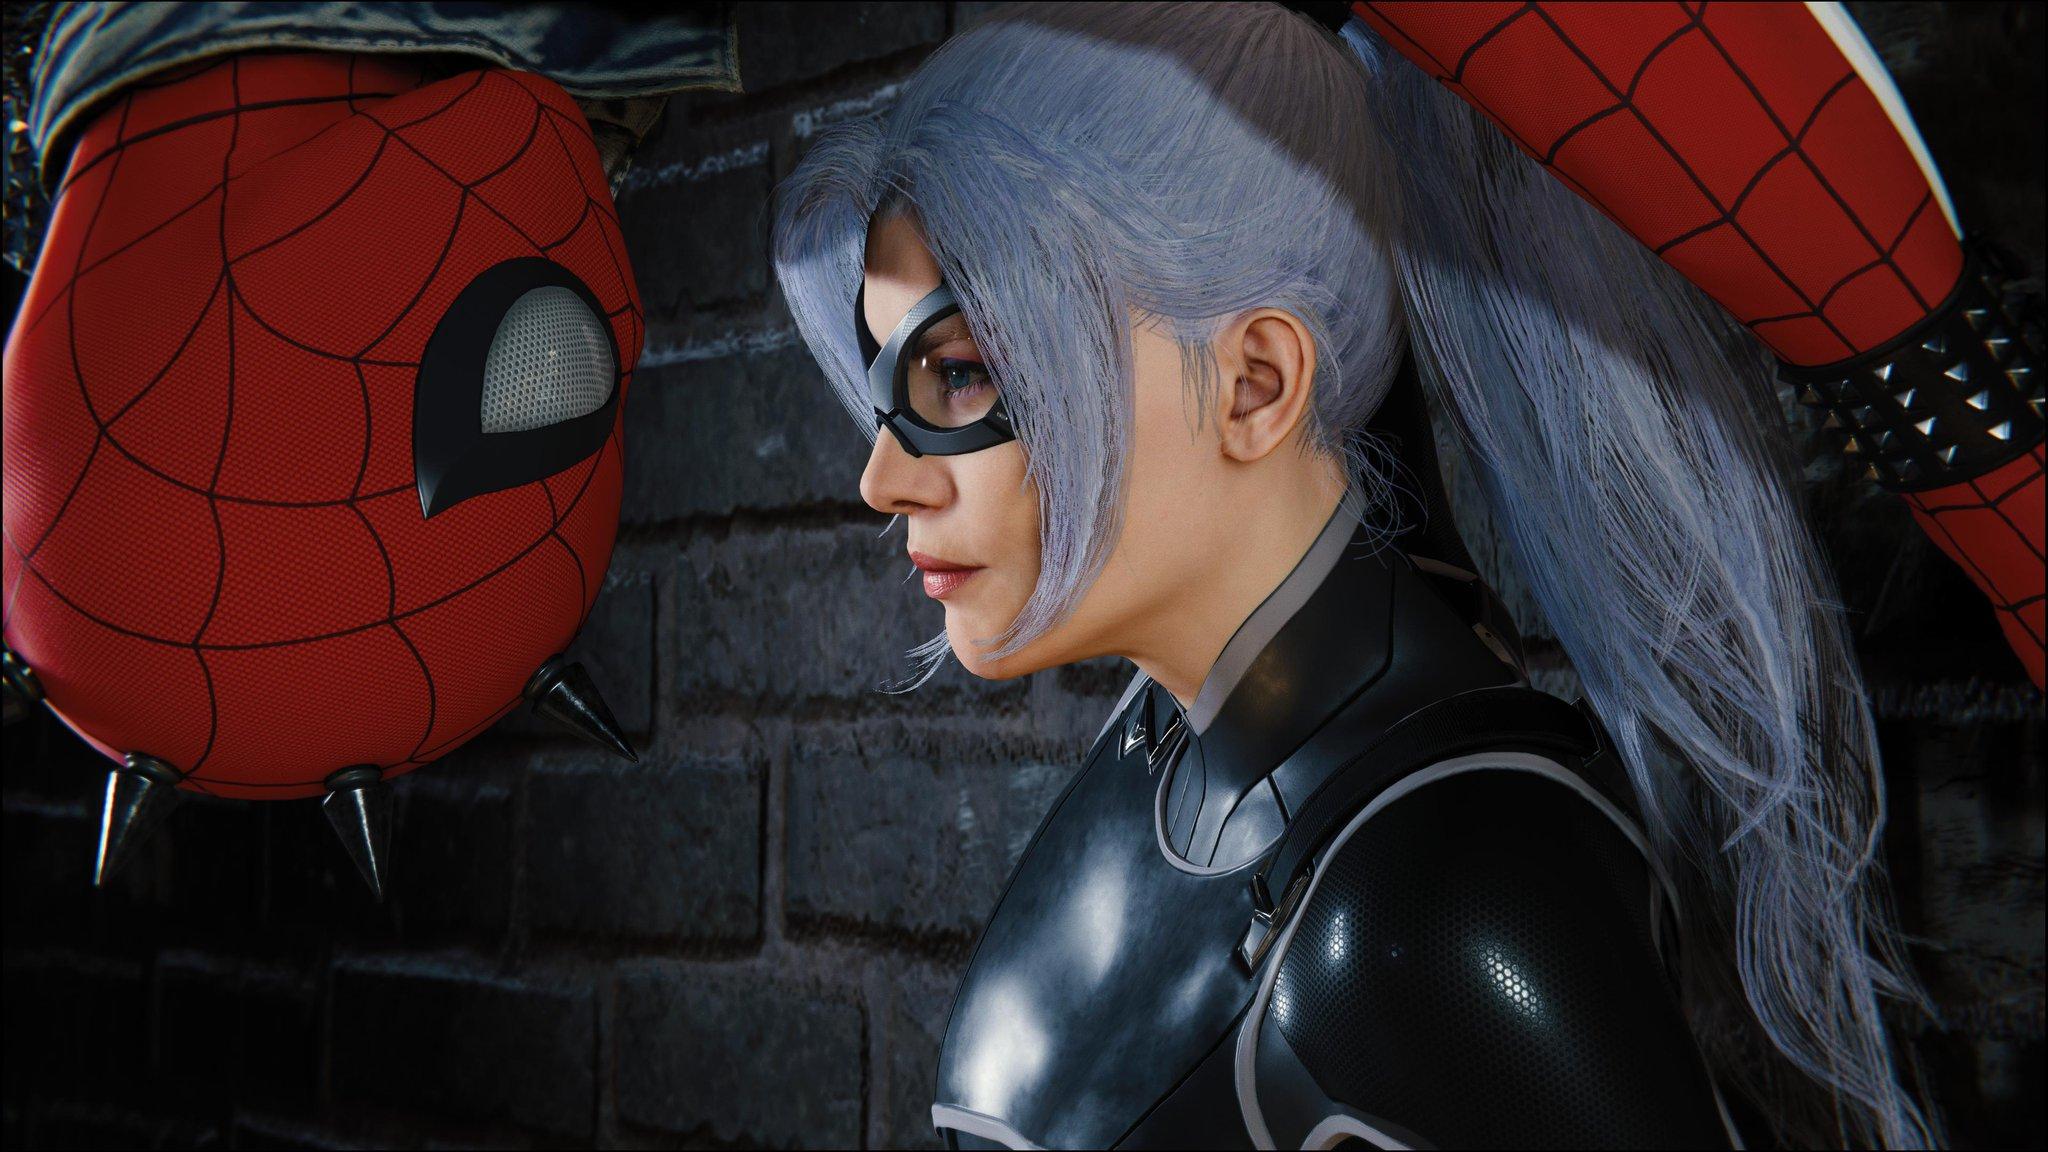 Spider-Man and Black Cat